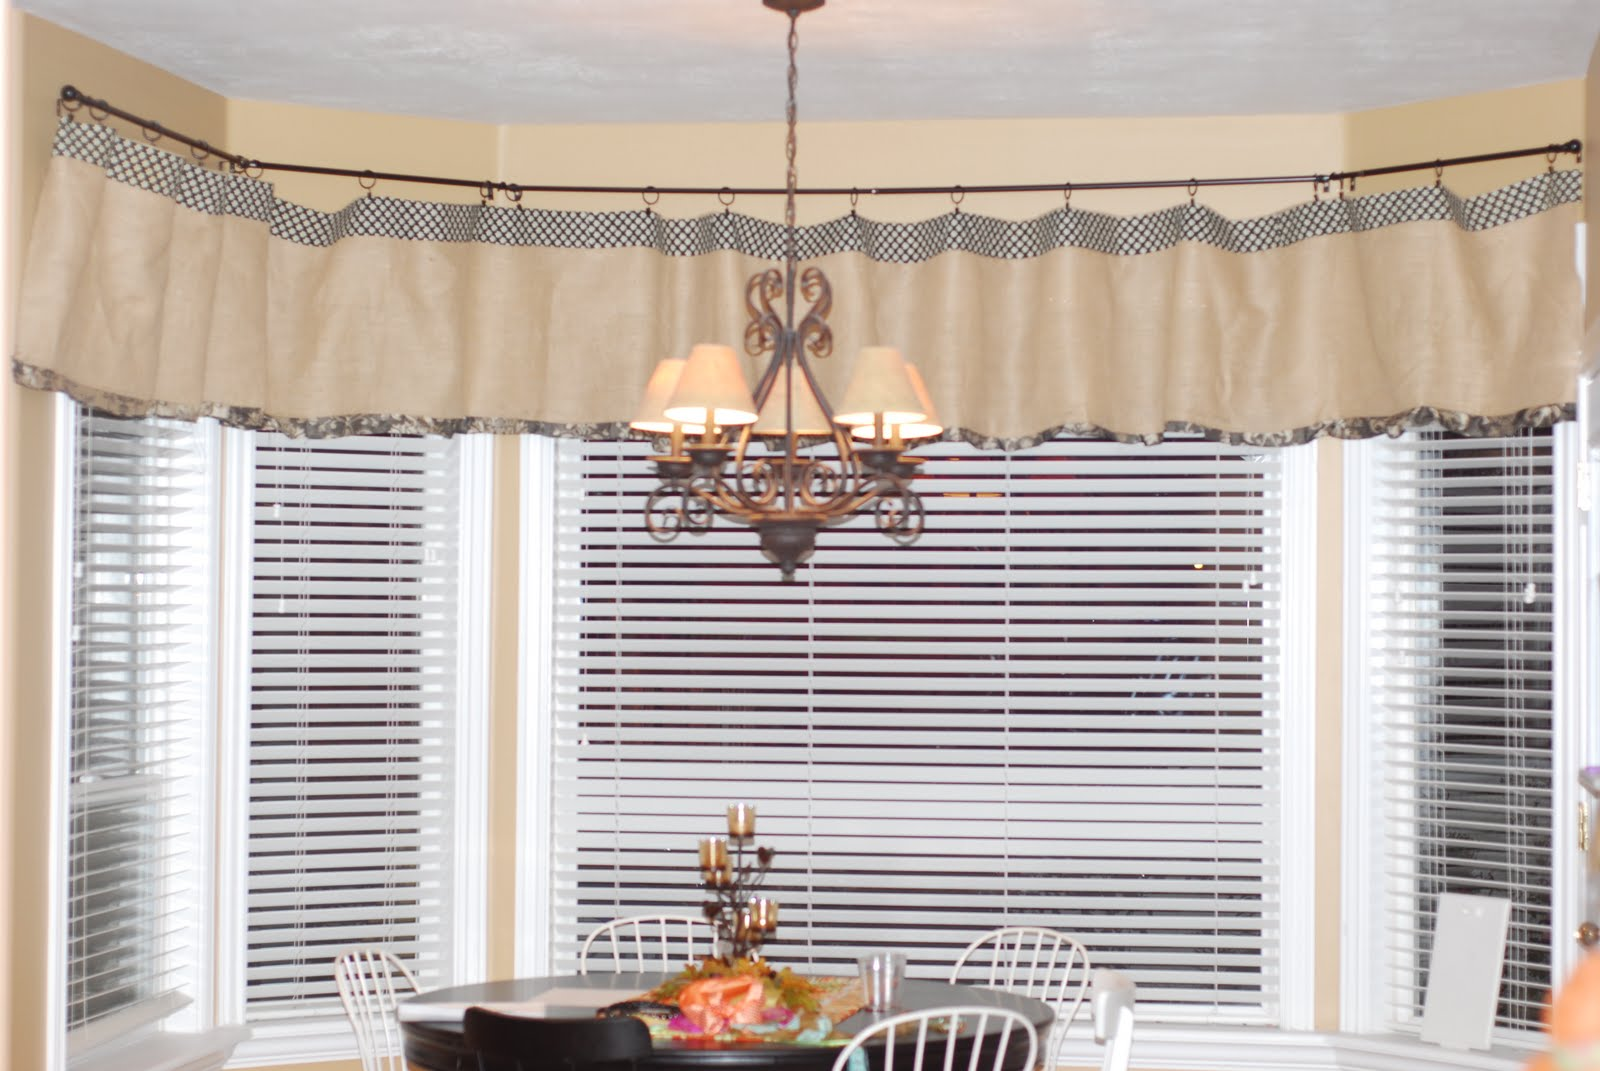 Burlap kitchen curtains no sew - Creative Fridays Burlap No Sew Kitchen Curtains